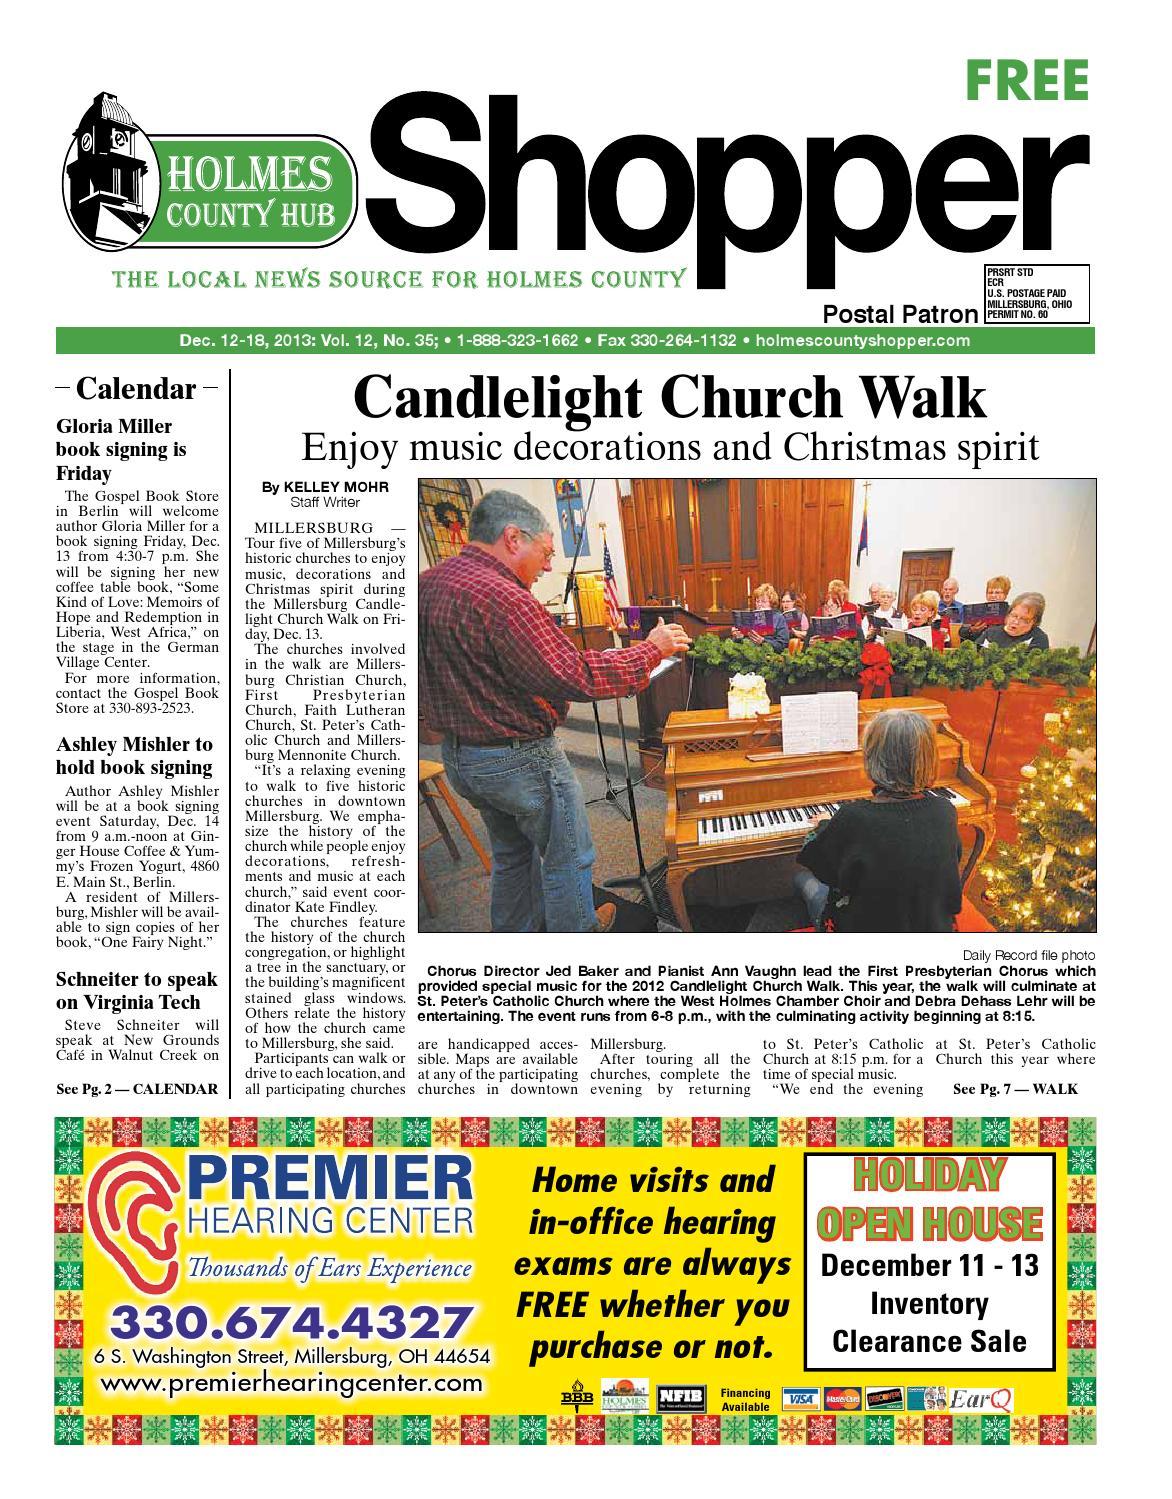 b285e85b0d1c34 Holmes County Hub Shopper, Dec. 12, 2013 by GateHouse Media NEO - issuu